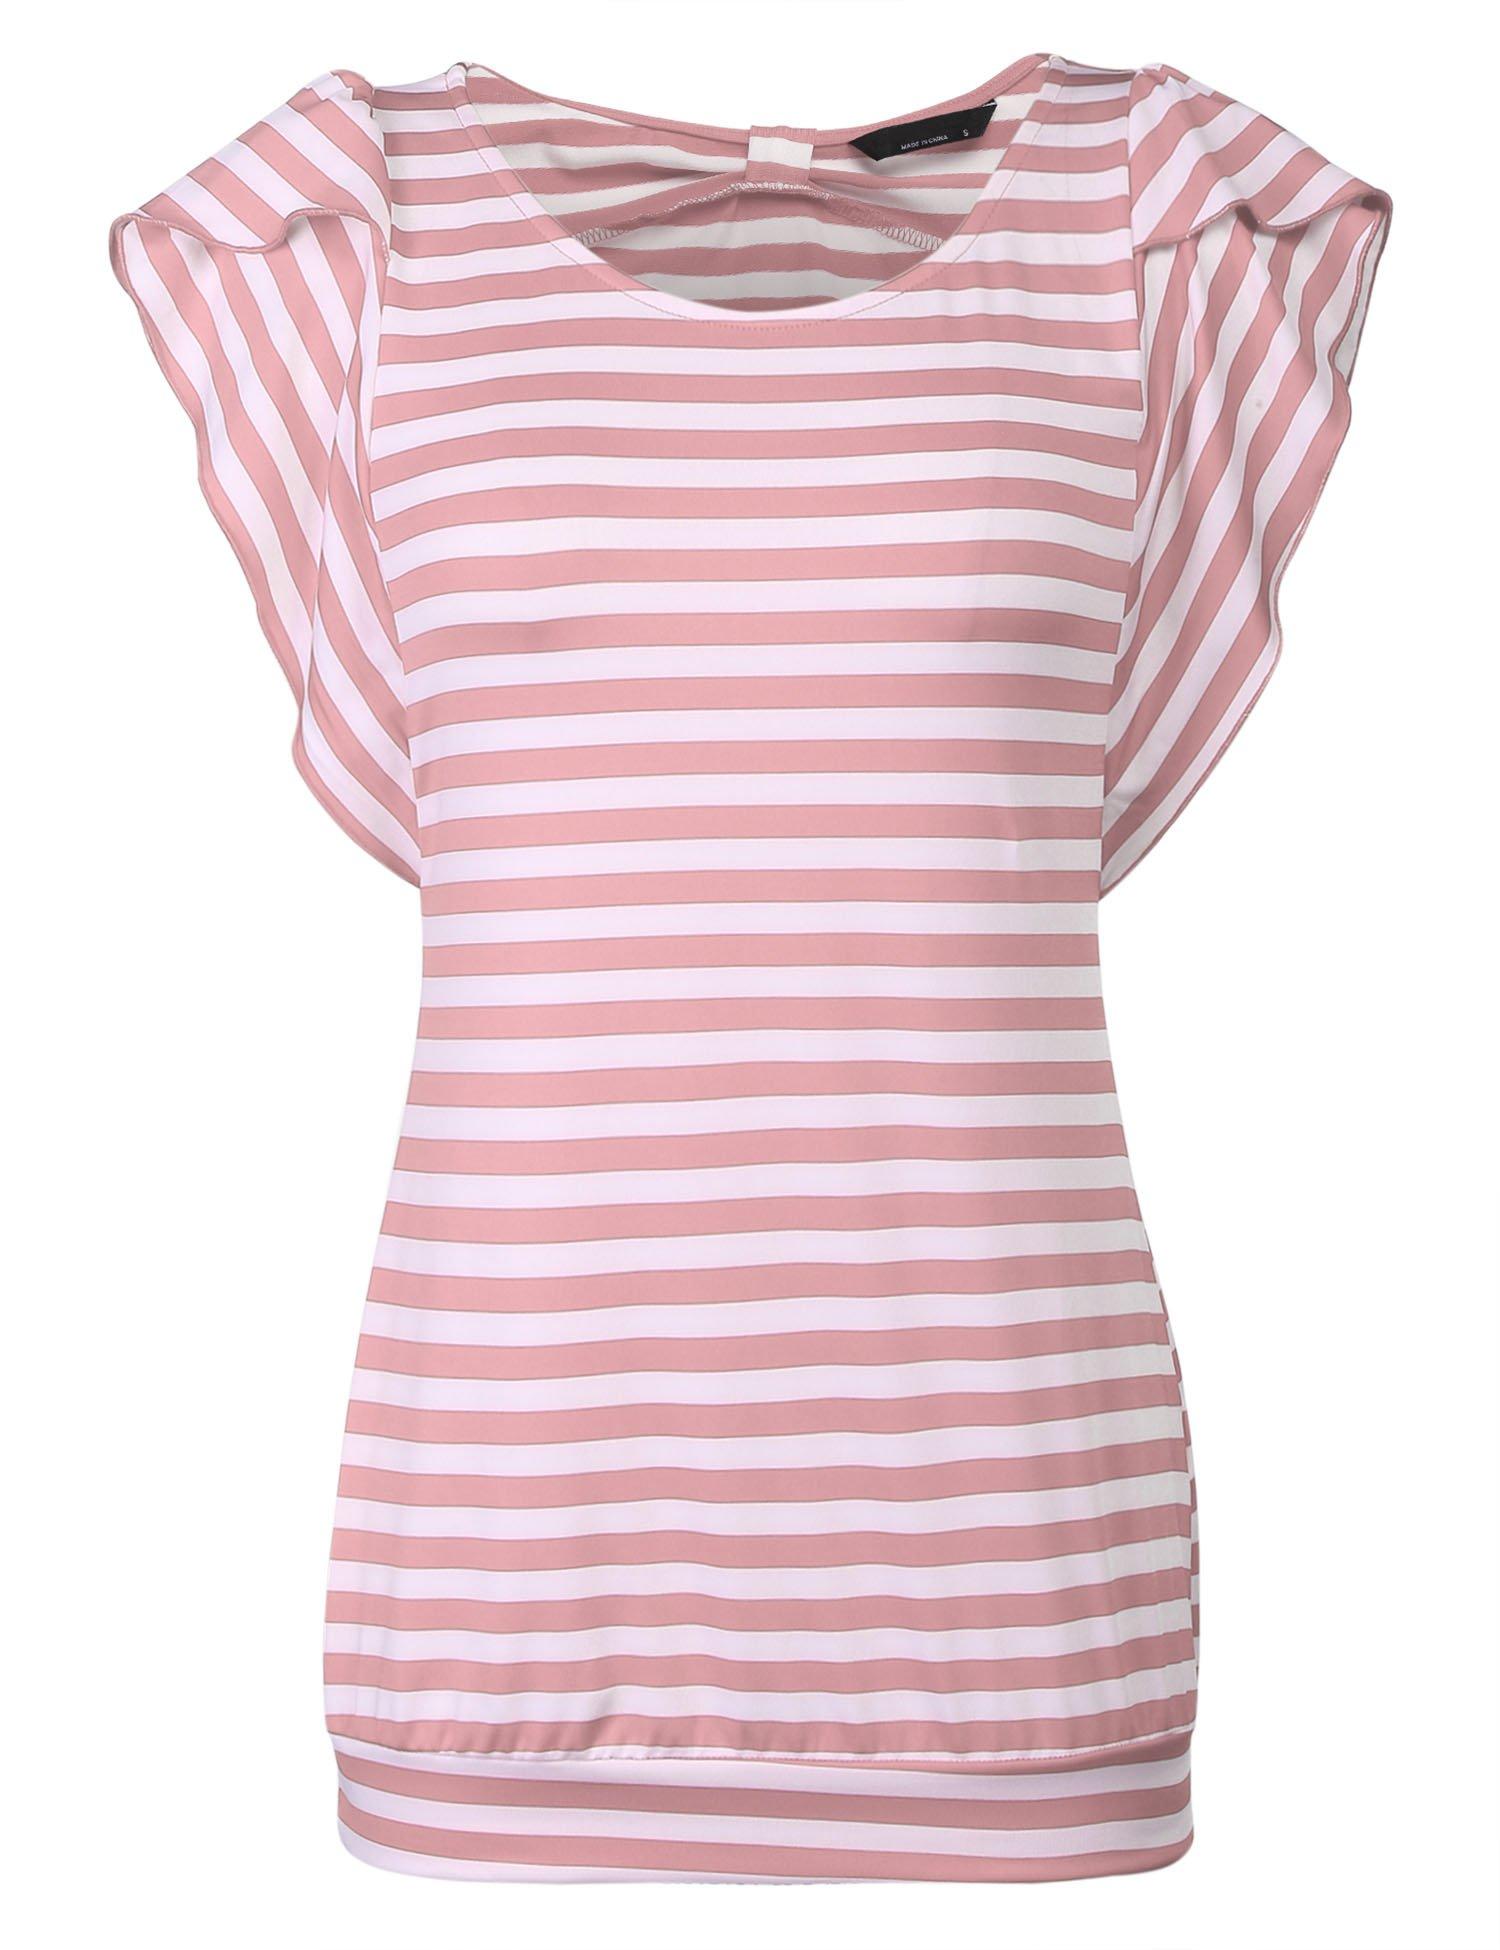 Hersife Womens Stripy Top Short Sleeve Tunics Striped Banded Bottom Shirts Pink